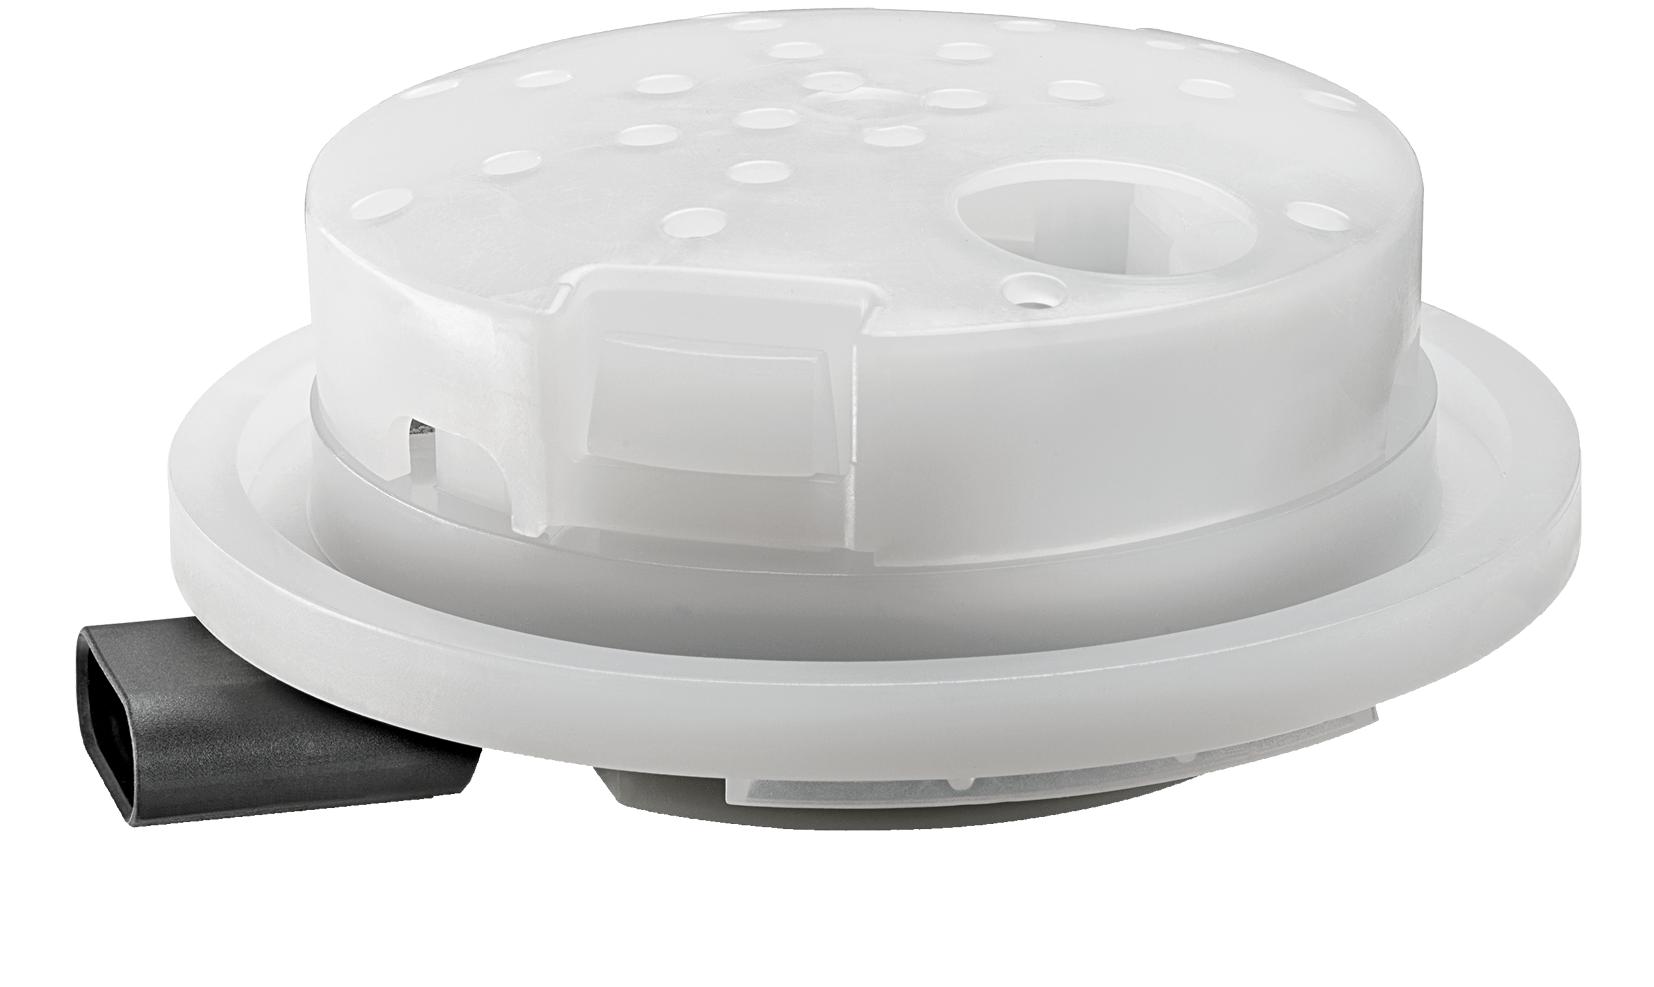 Continental urea level, quality, and temperature sensor